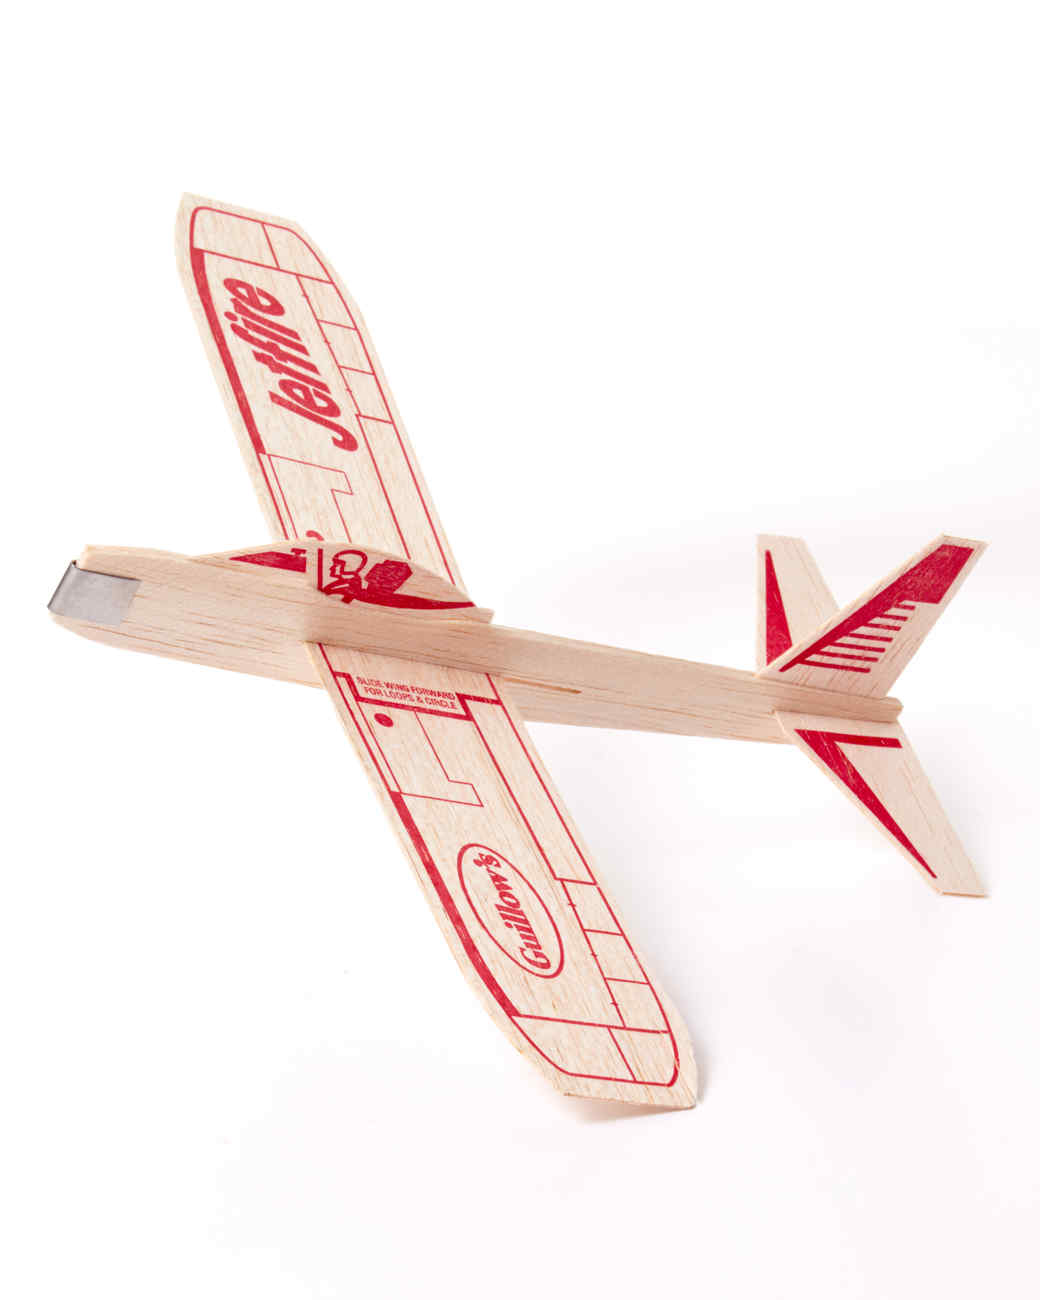 boy-basket-balsa-wood-plane-2745-d112789-0116.jpg